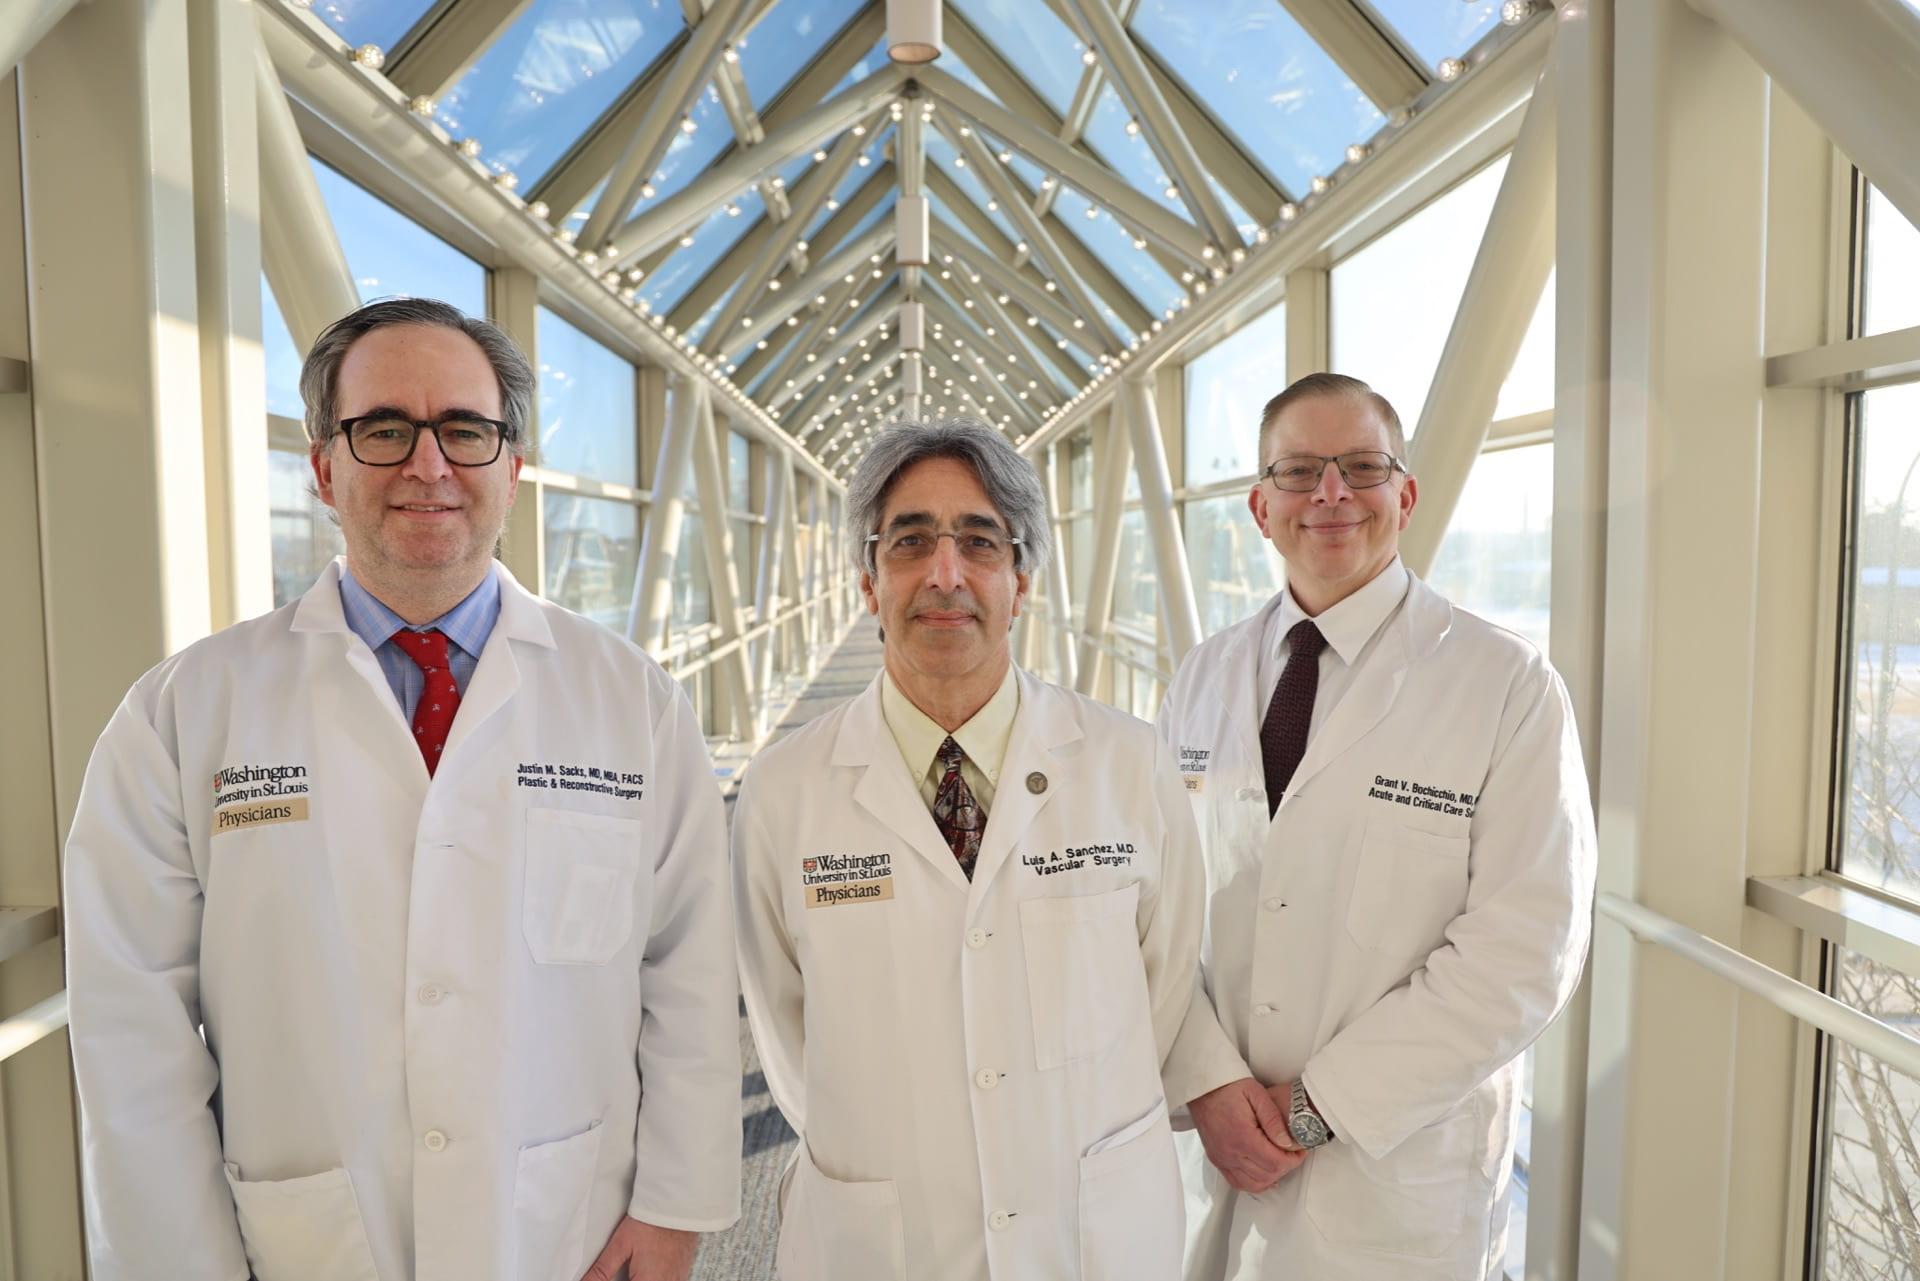 Limb Preservation Doctors Sacks, Sanchez and Bochicchio